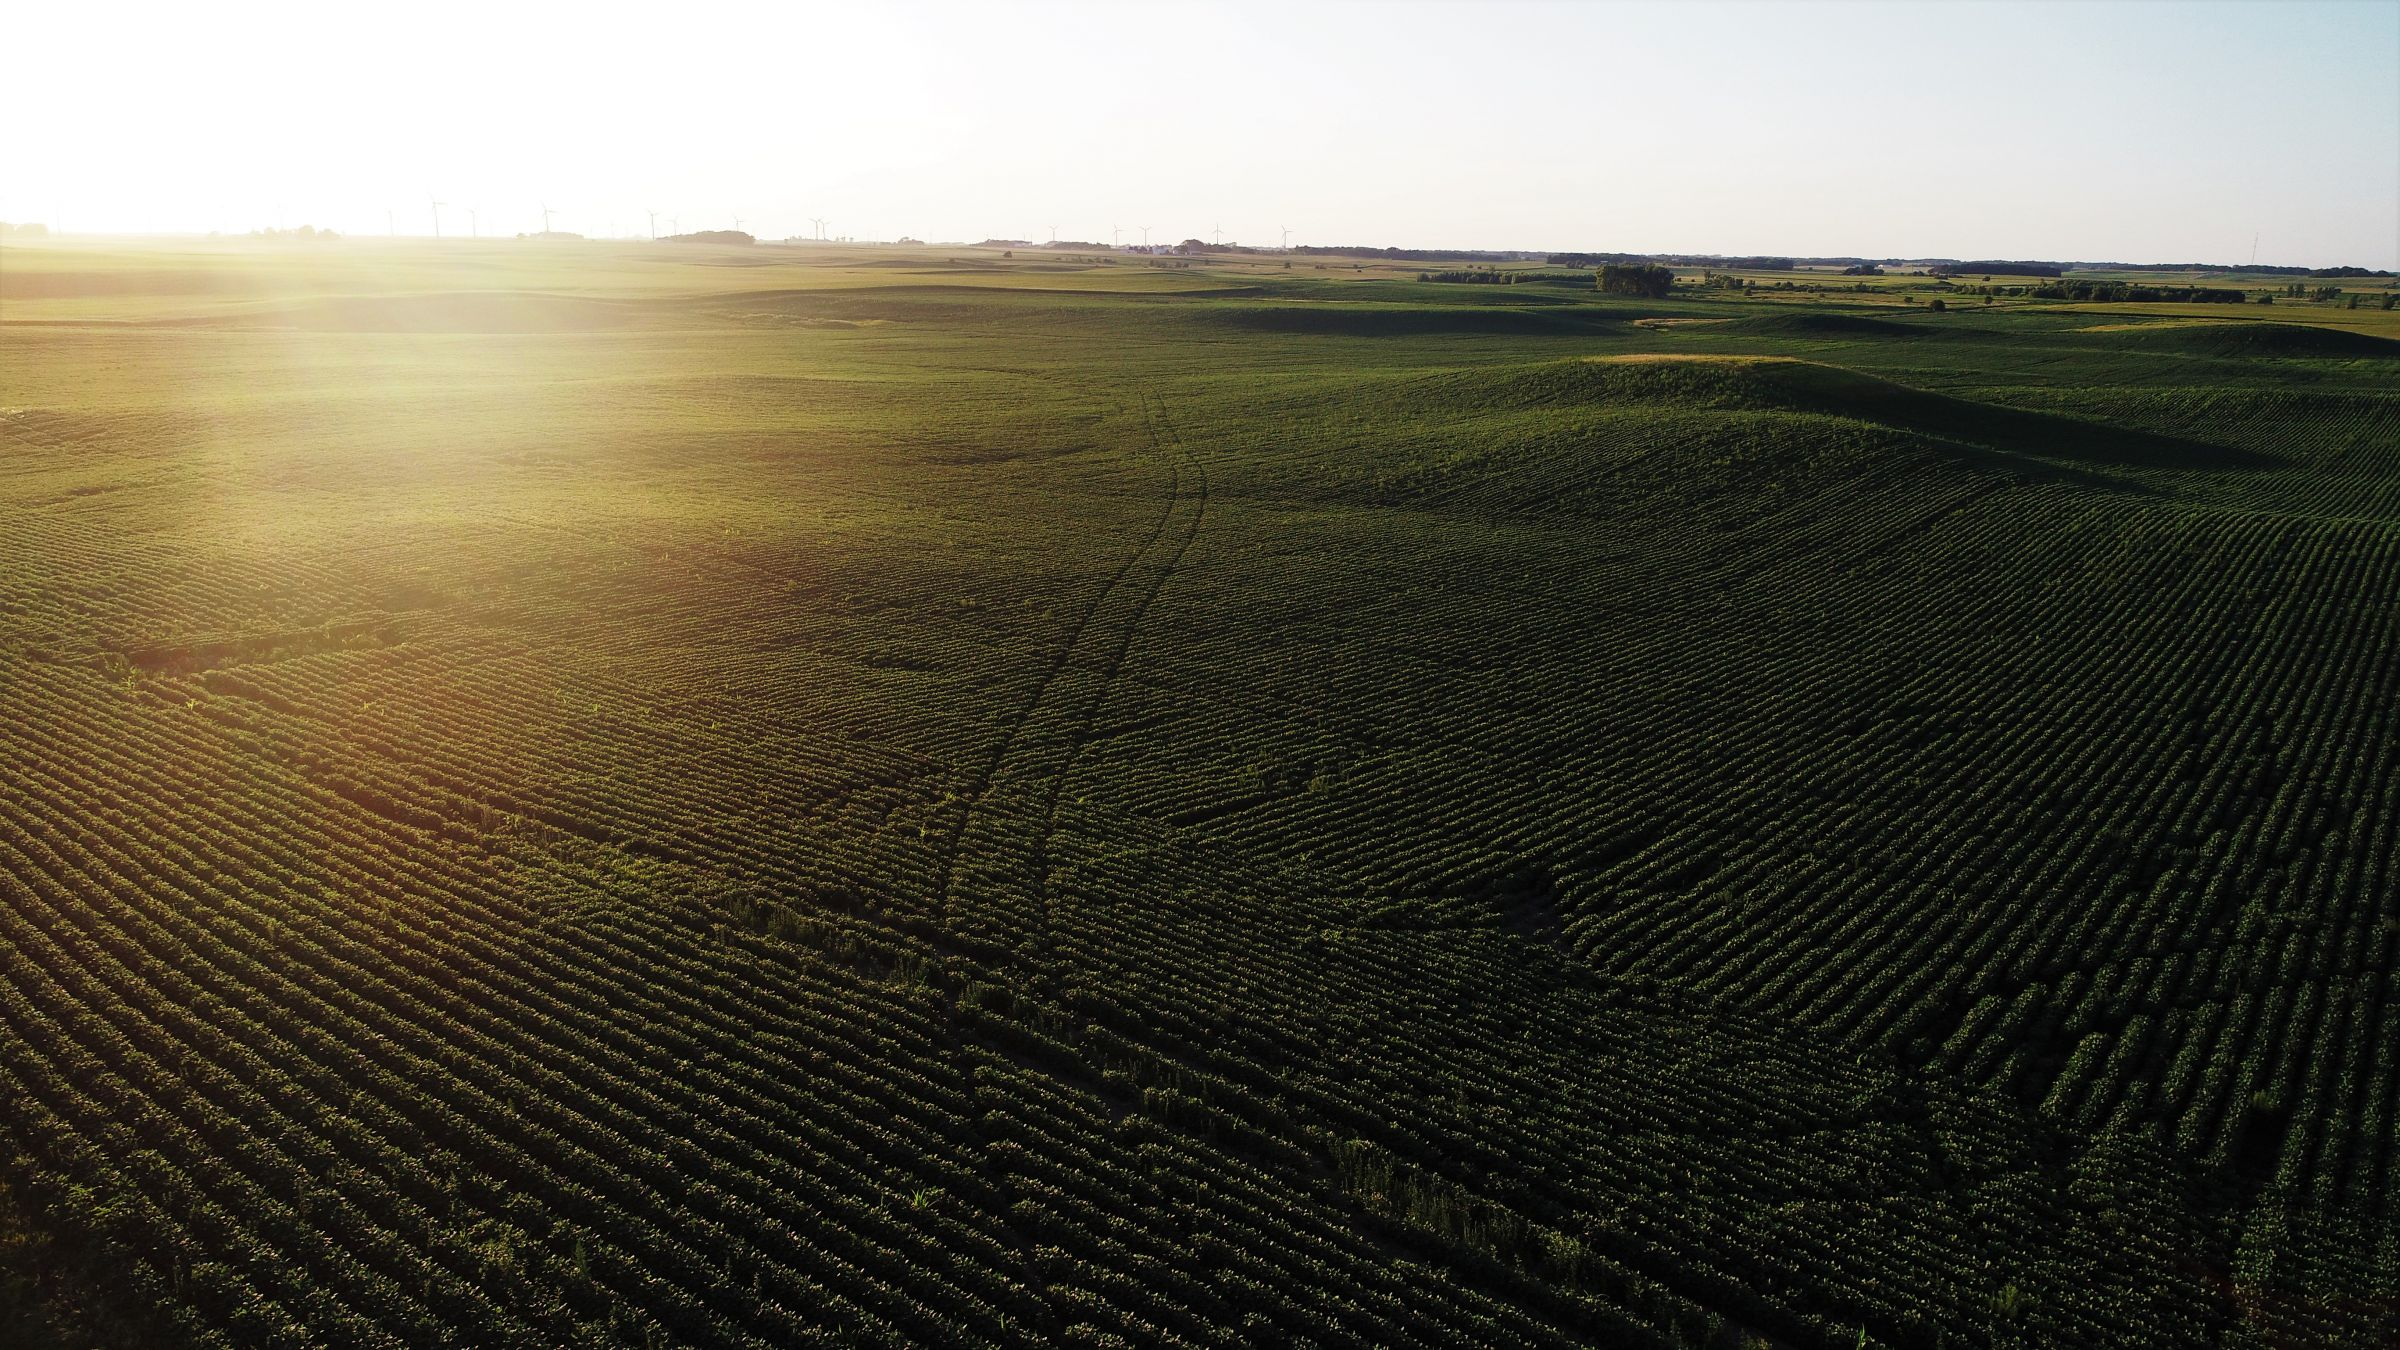 14763-cerro-gordo-farmland-for-sale-200-acres-ml-0-2019-11-07-180507.jpg